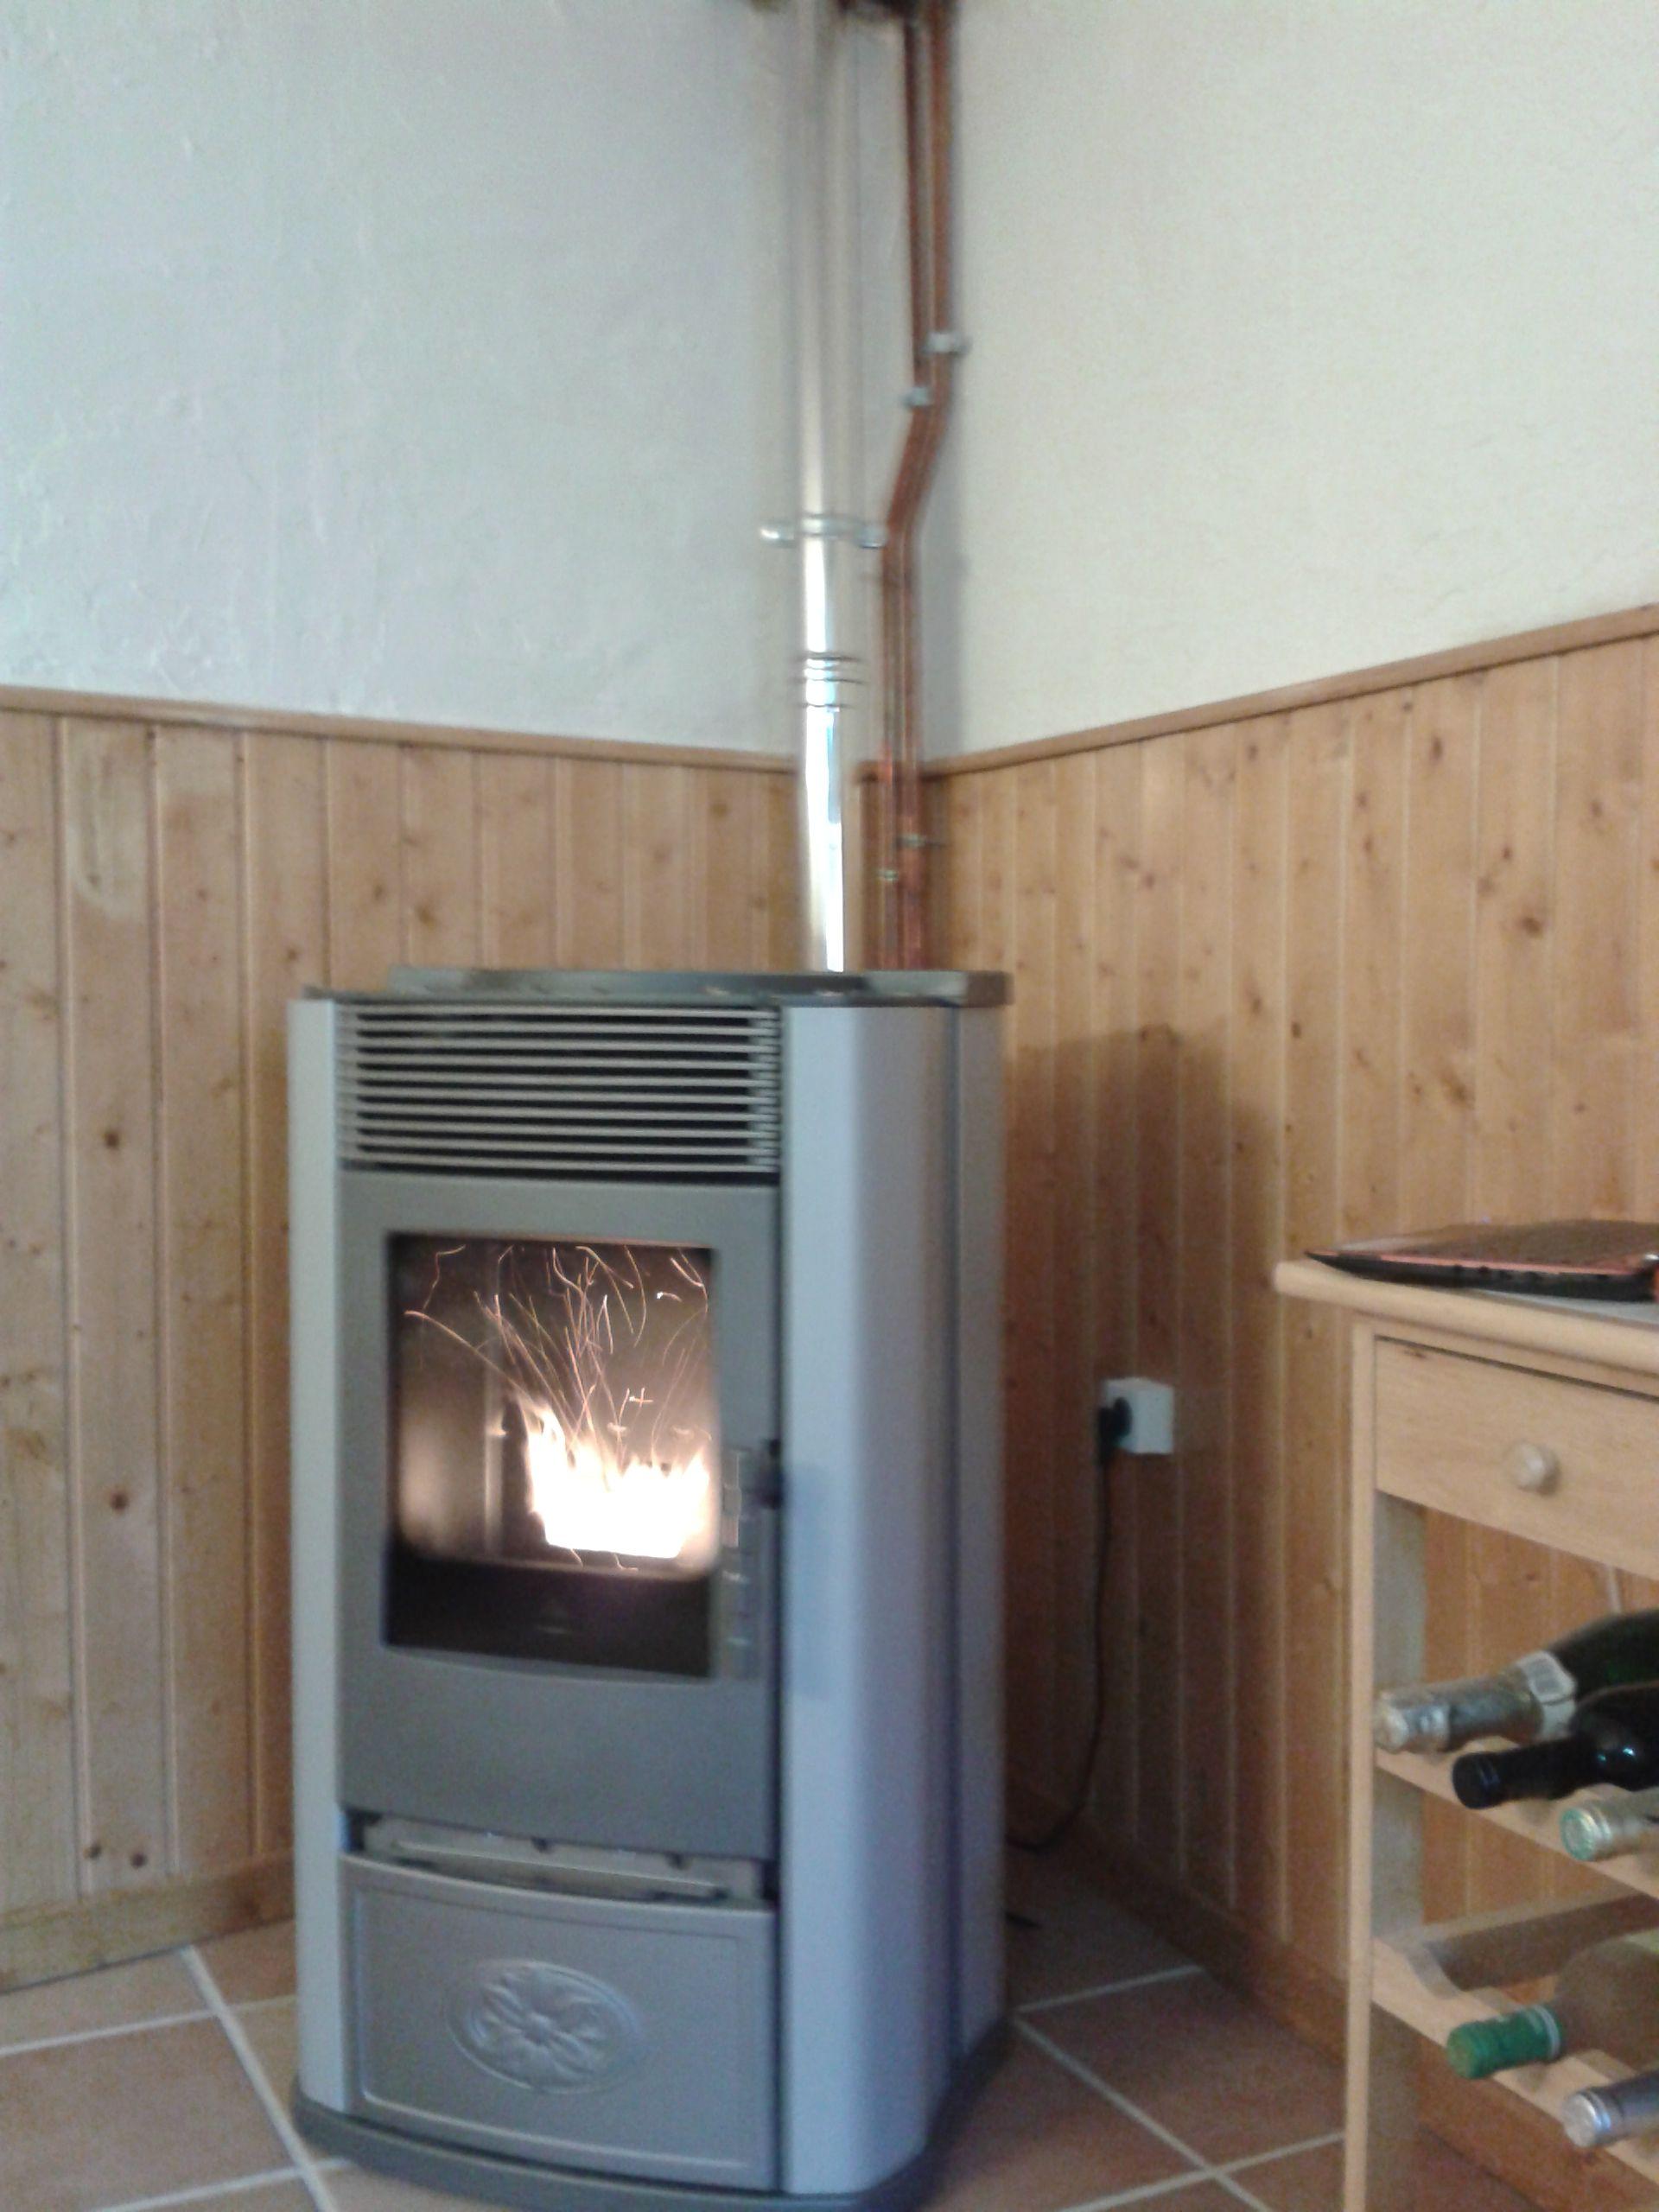 Termoestufa de pellet edilkamin ecoidro para calefacci n for Estufa lena calefaccion radiadores